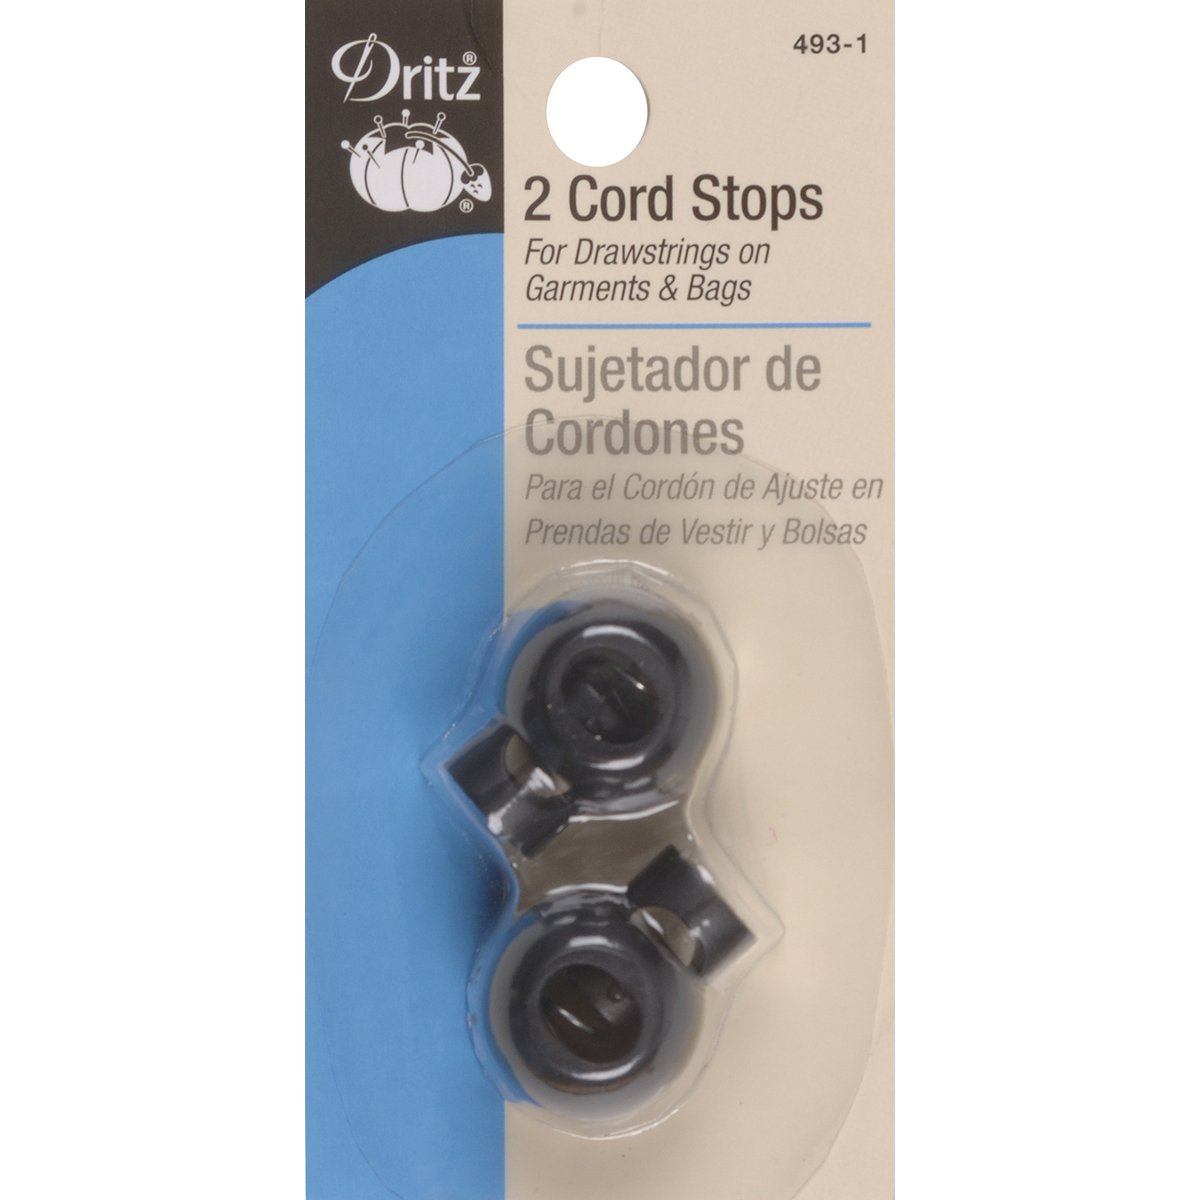 Dritz Cord Stops - Black 493-1